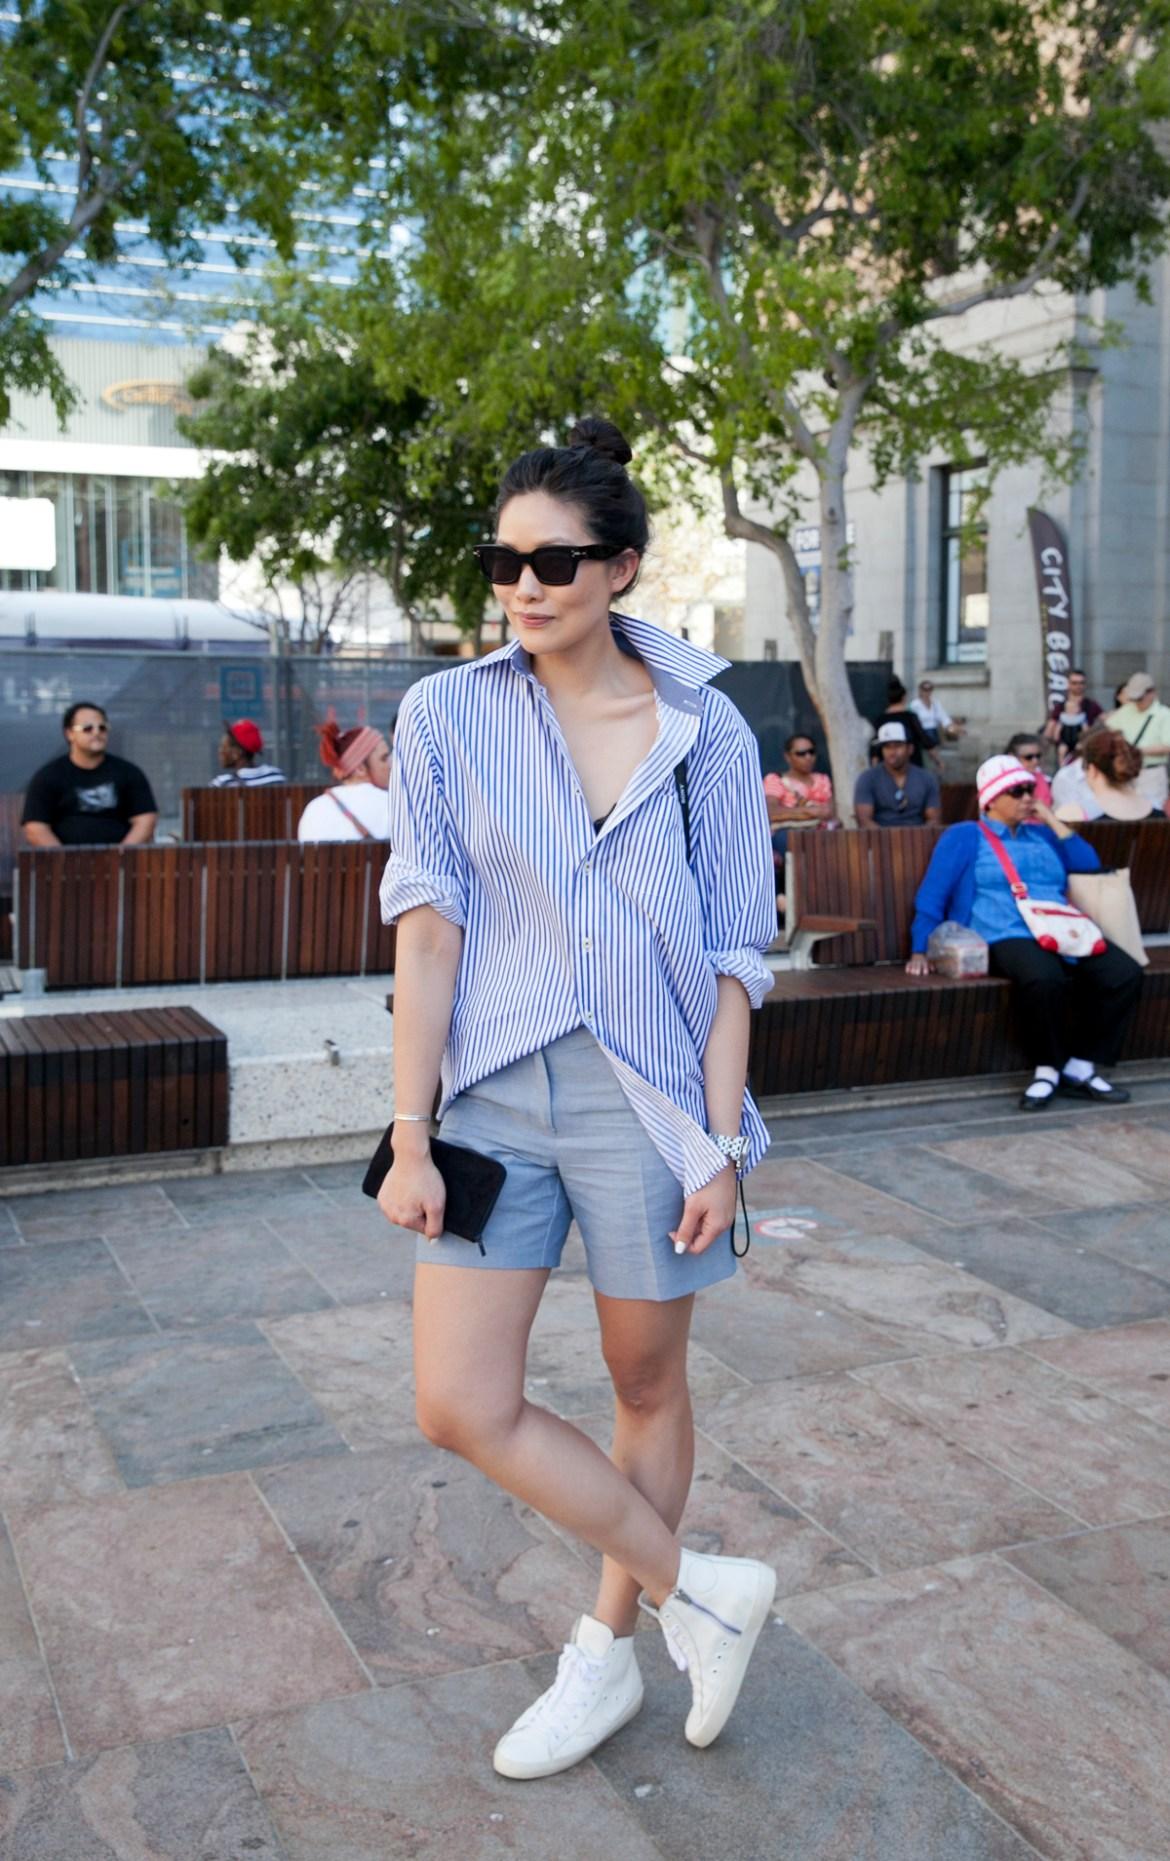 Street_Style_Sat_TPFF_Jacquelyn2Lg